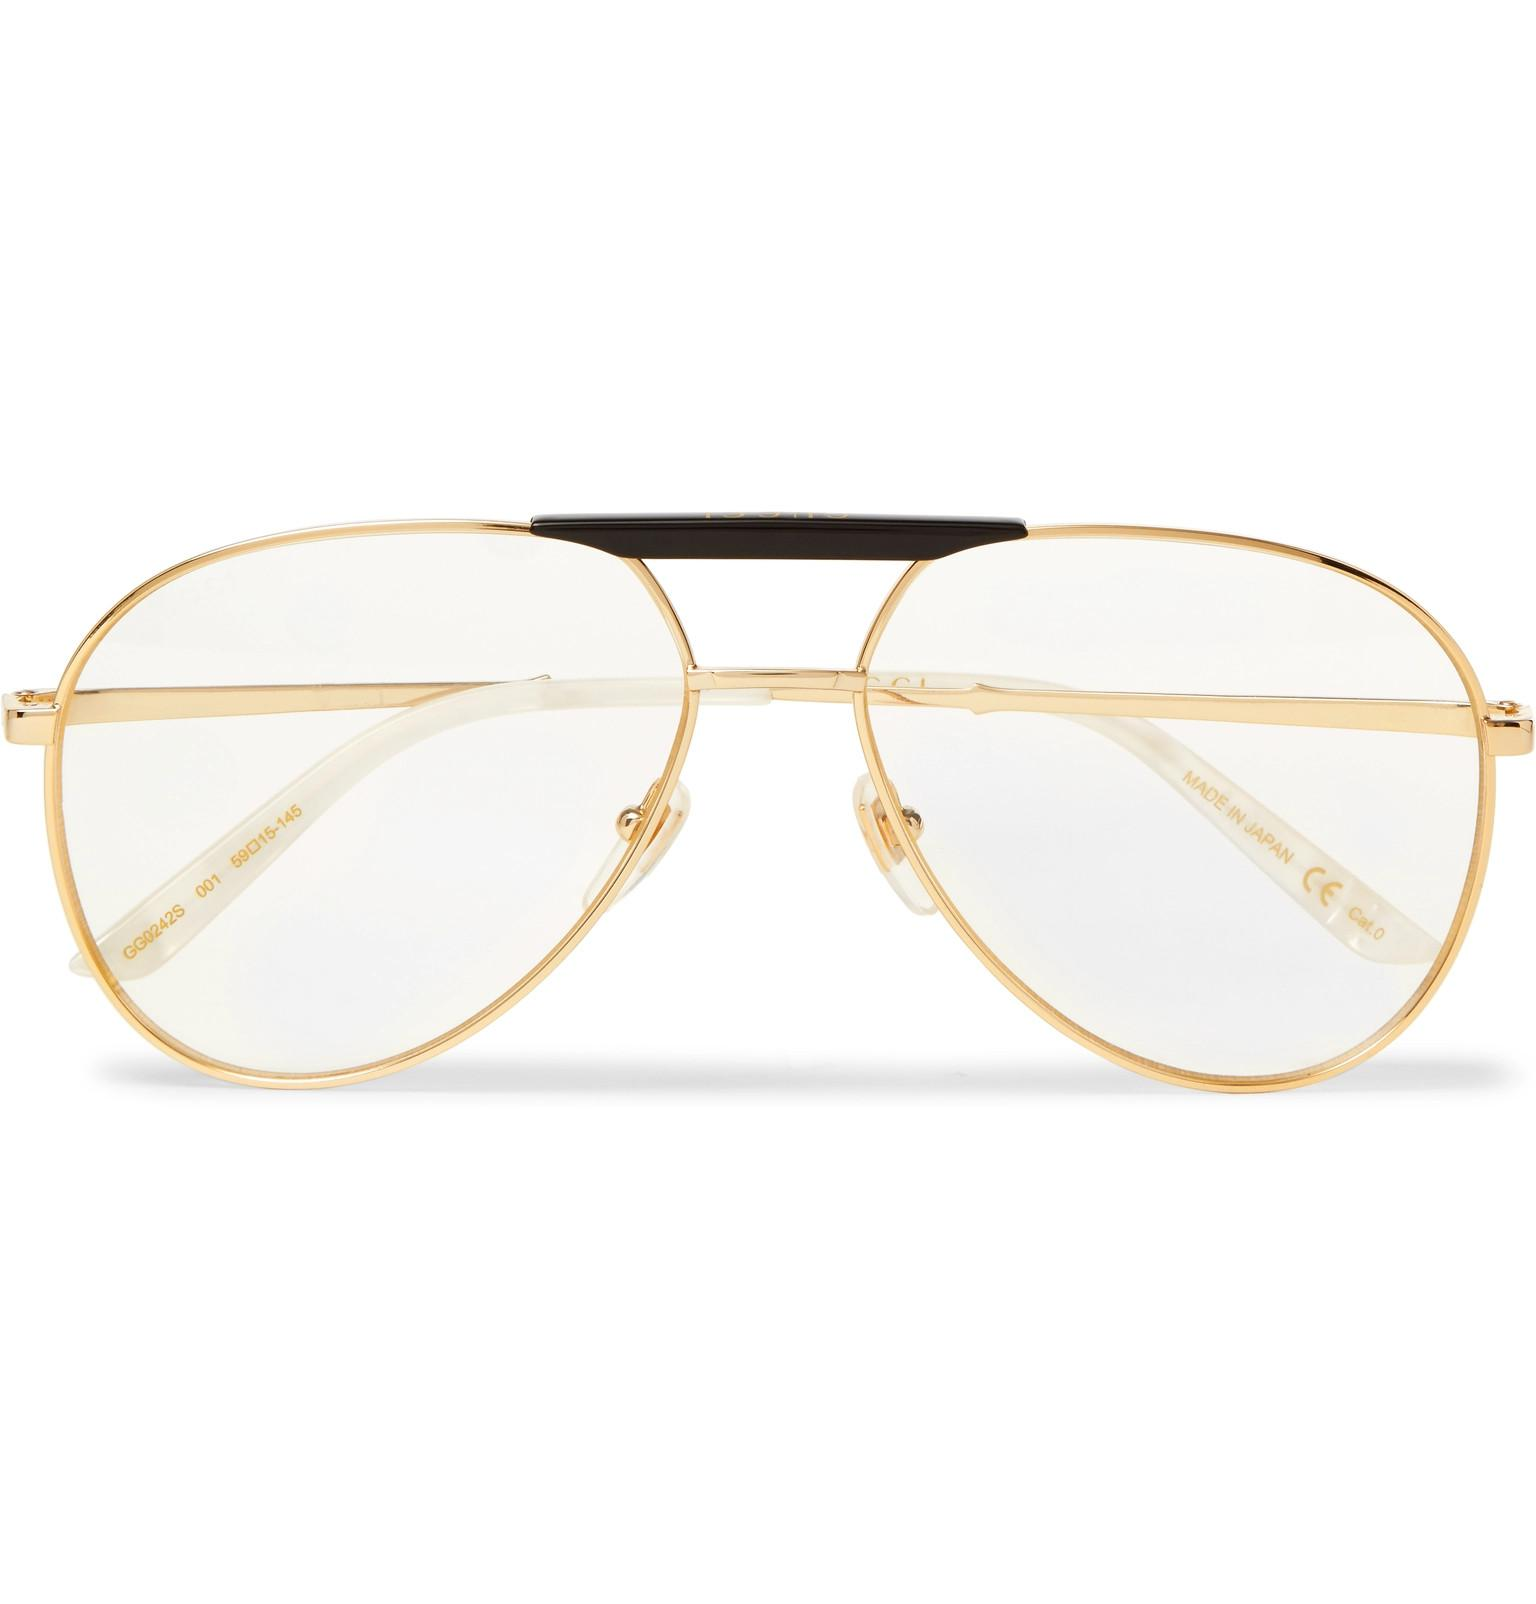 a38a1fe39addb Gucci Endura Aviator-style Acetate And Gold-tone Optical Glasses in ...